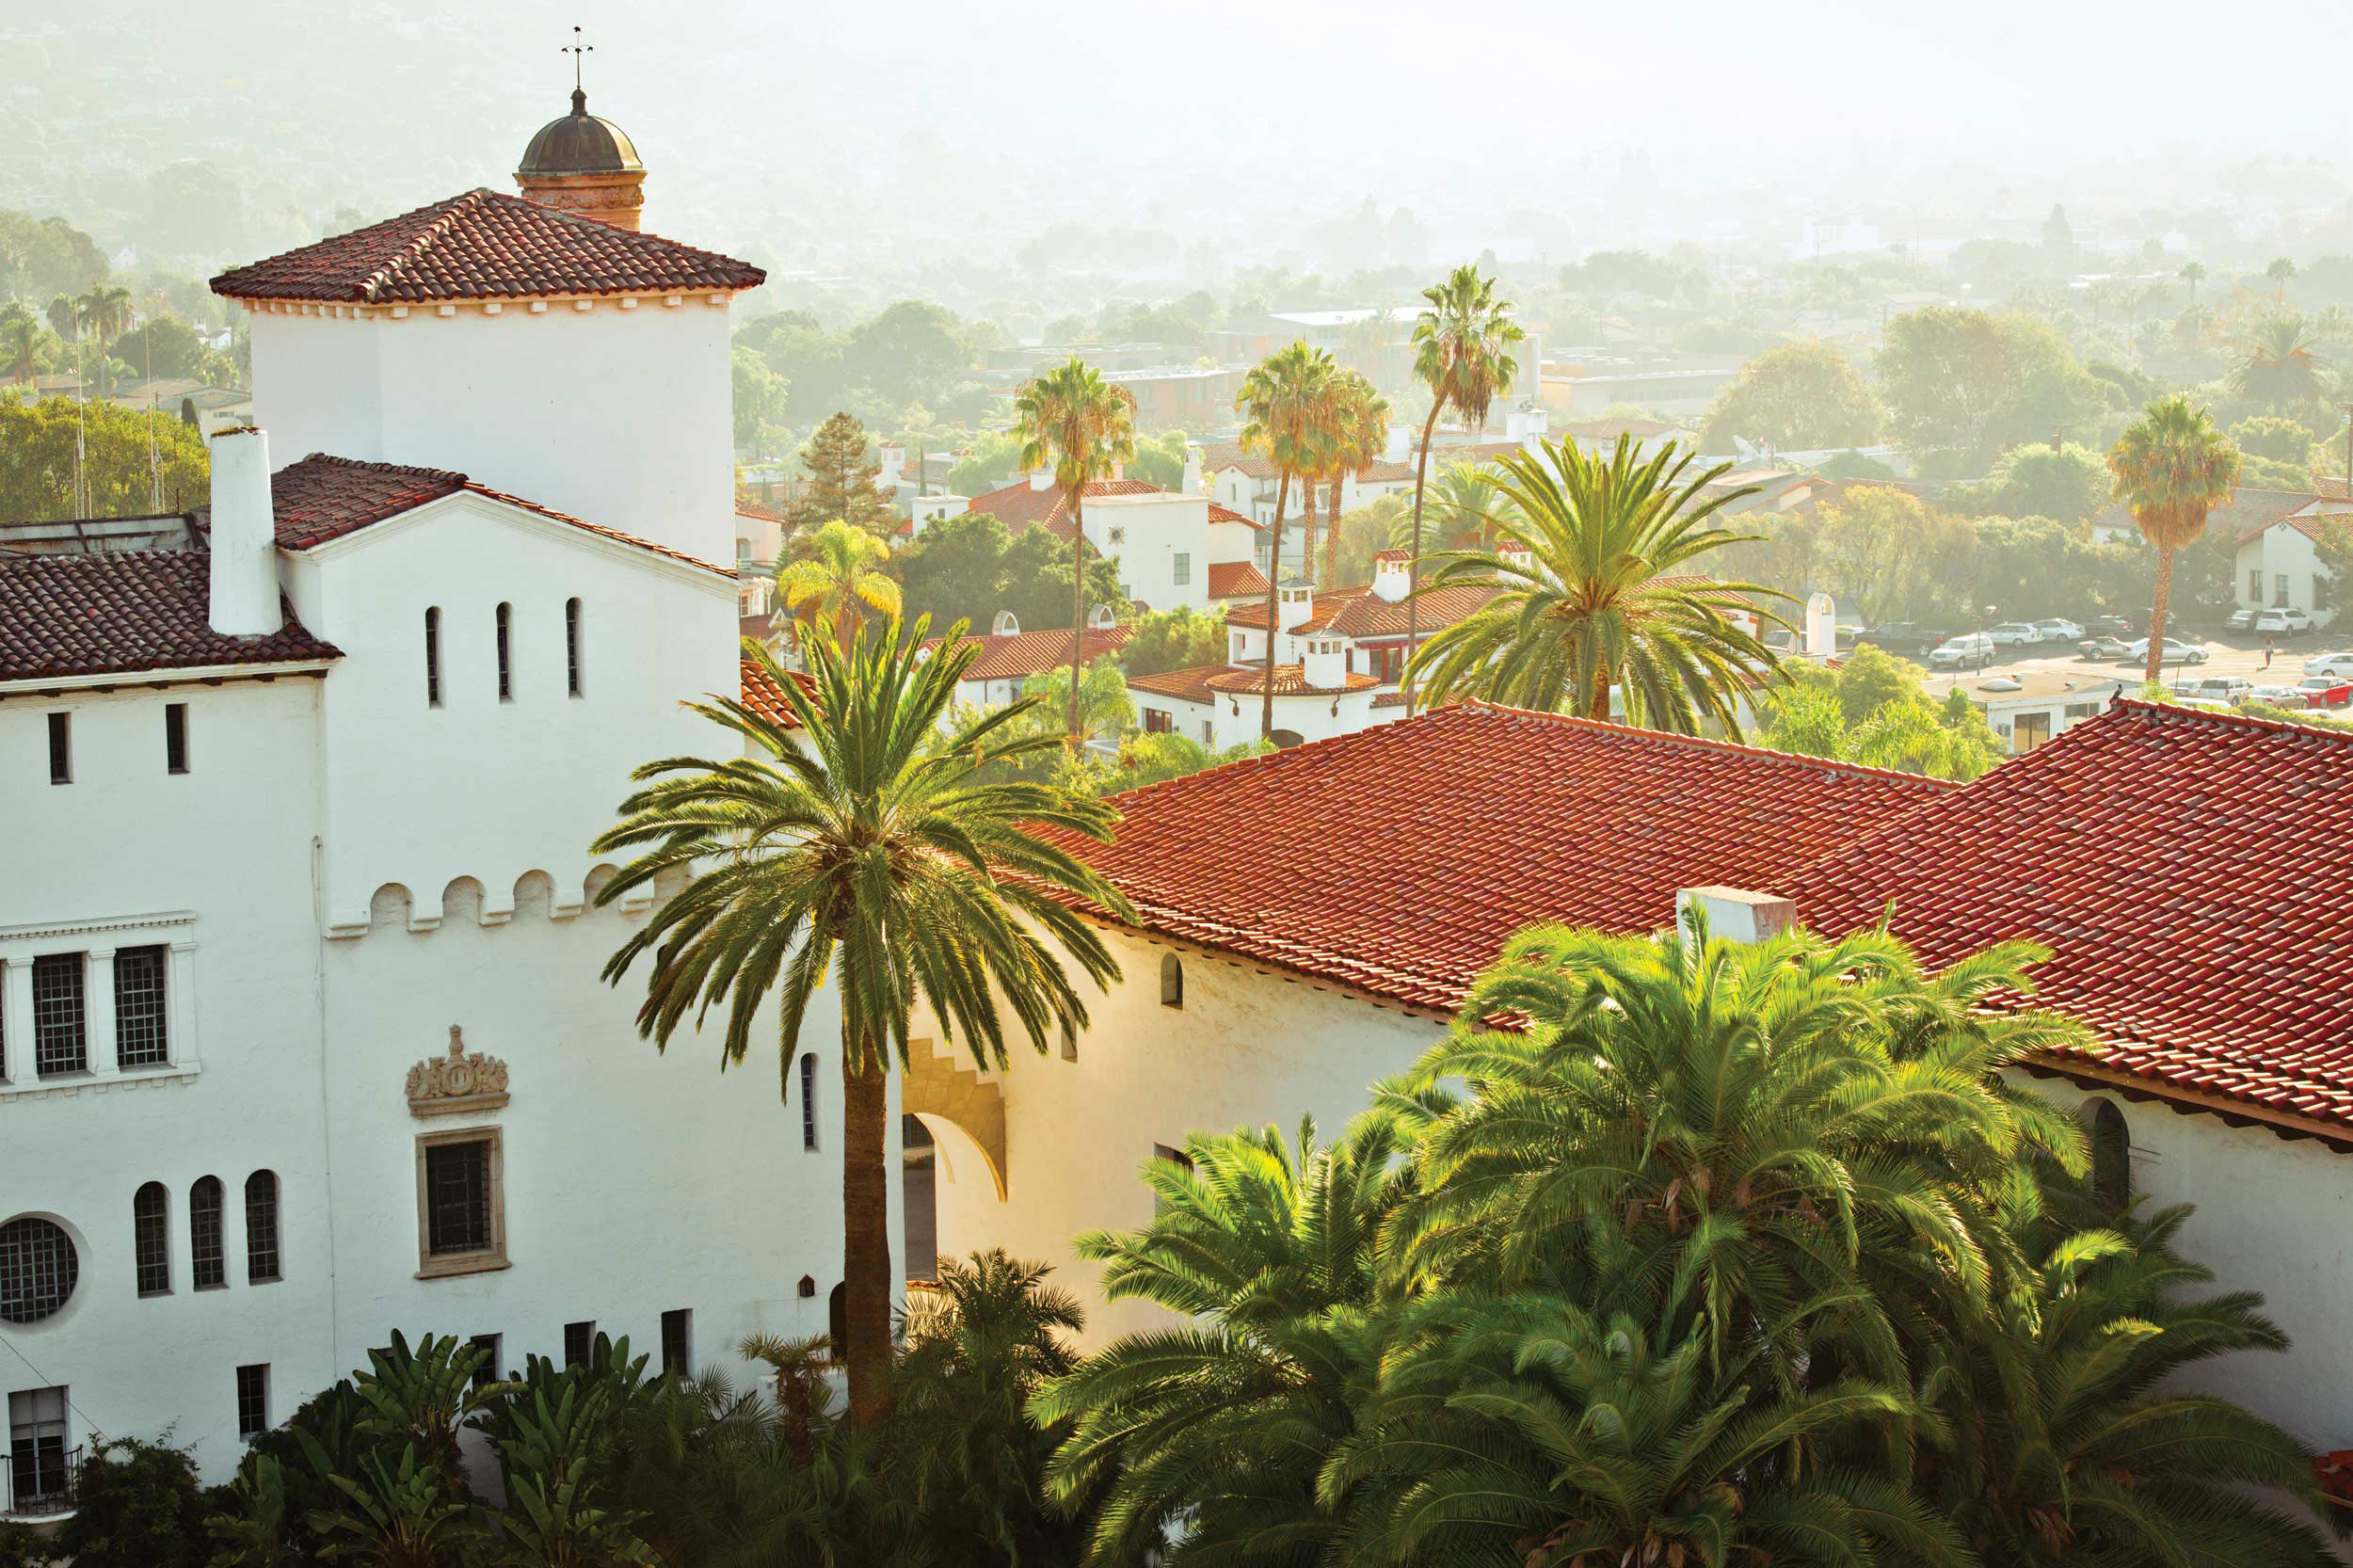 Santa Barbara, CA | Hotels, Restaurants, Events & Activities